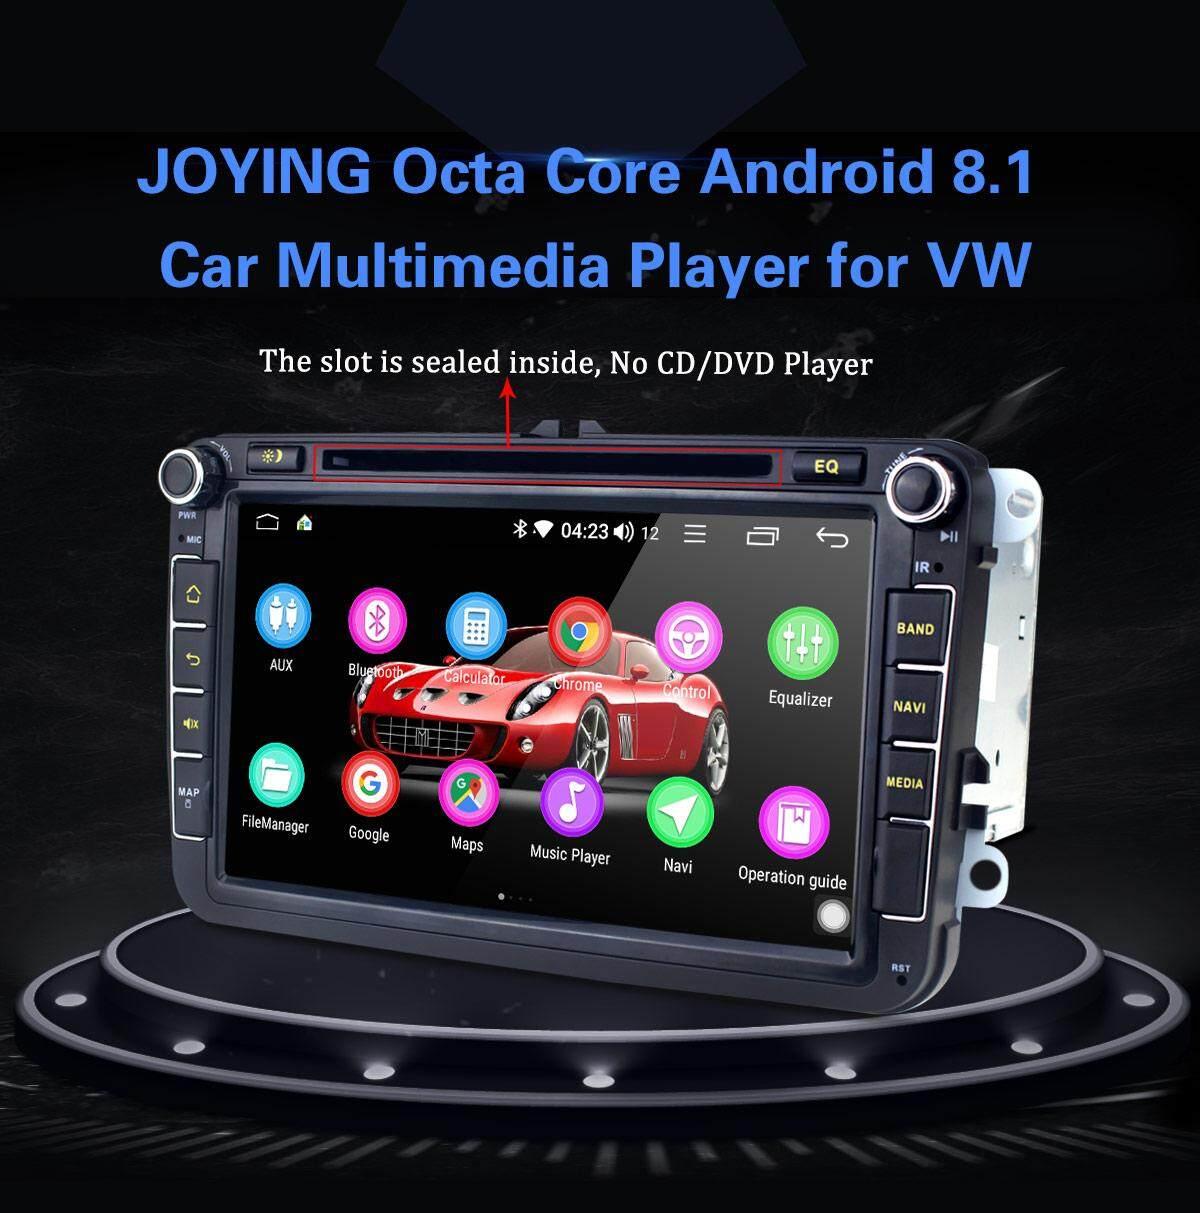 JOYING android 8 1 car stereo head unit 2 din 8inch touch screen radio for  Skoda/Seat/Volkswagen/VW/Passat b7/POLO/GOLF 5 6/Jetta car multimedia